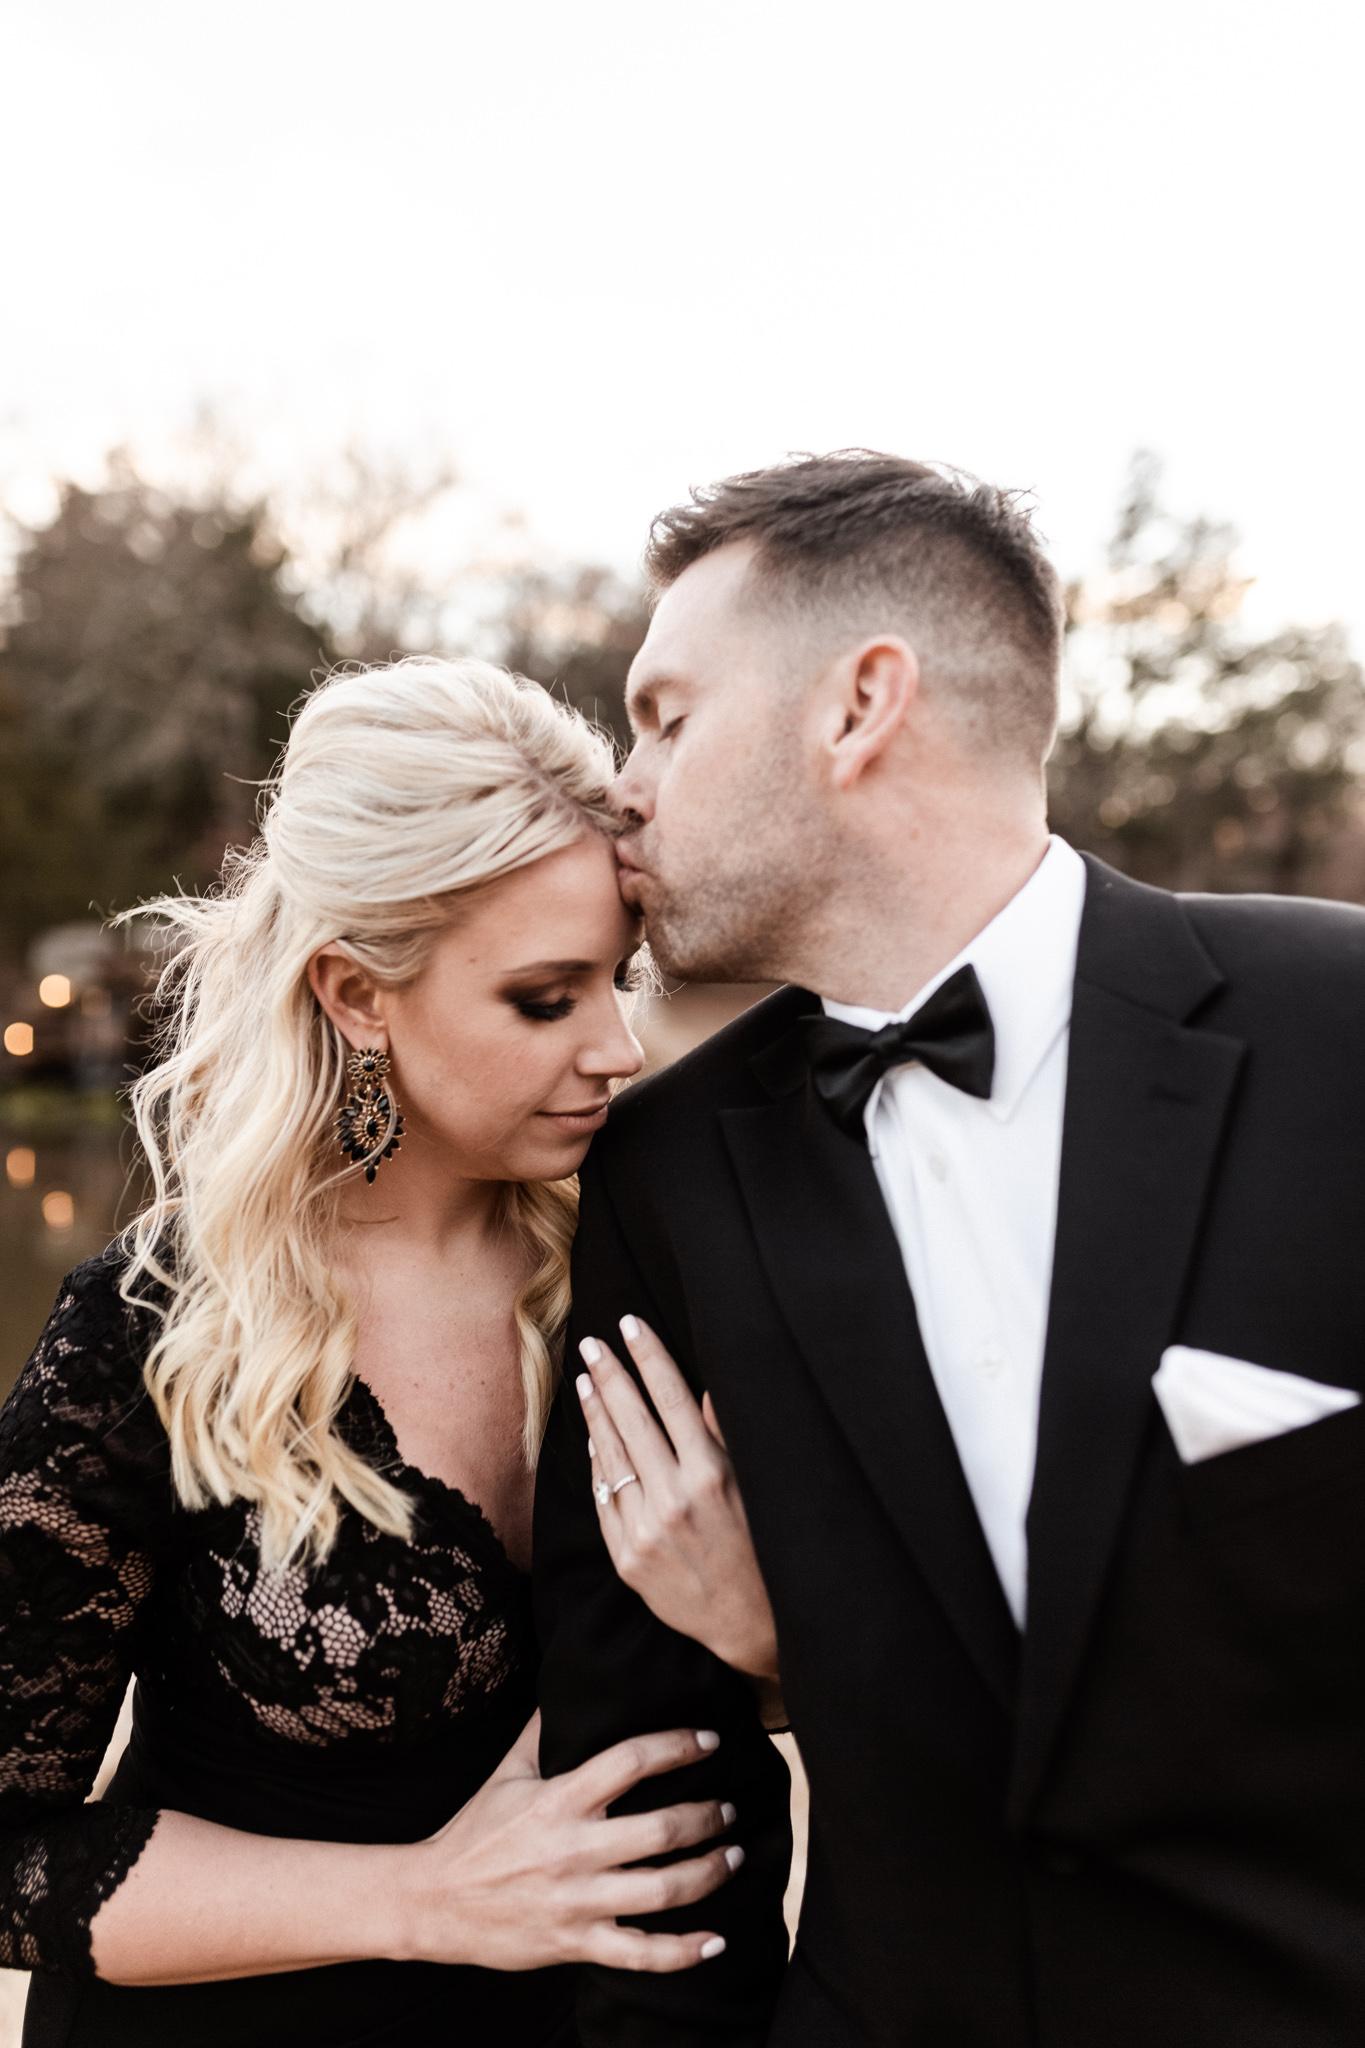 Wade + Stephanie | Warm Open Field Engagements | Oklahoma Wedding Photographer-51.jpg